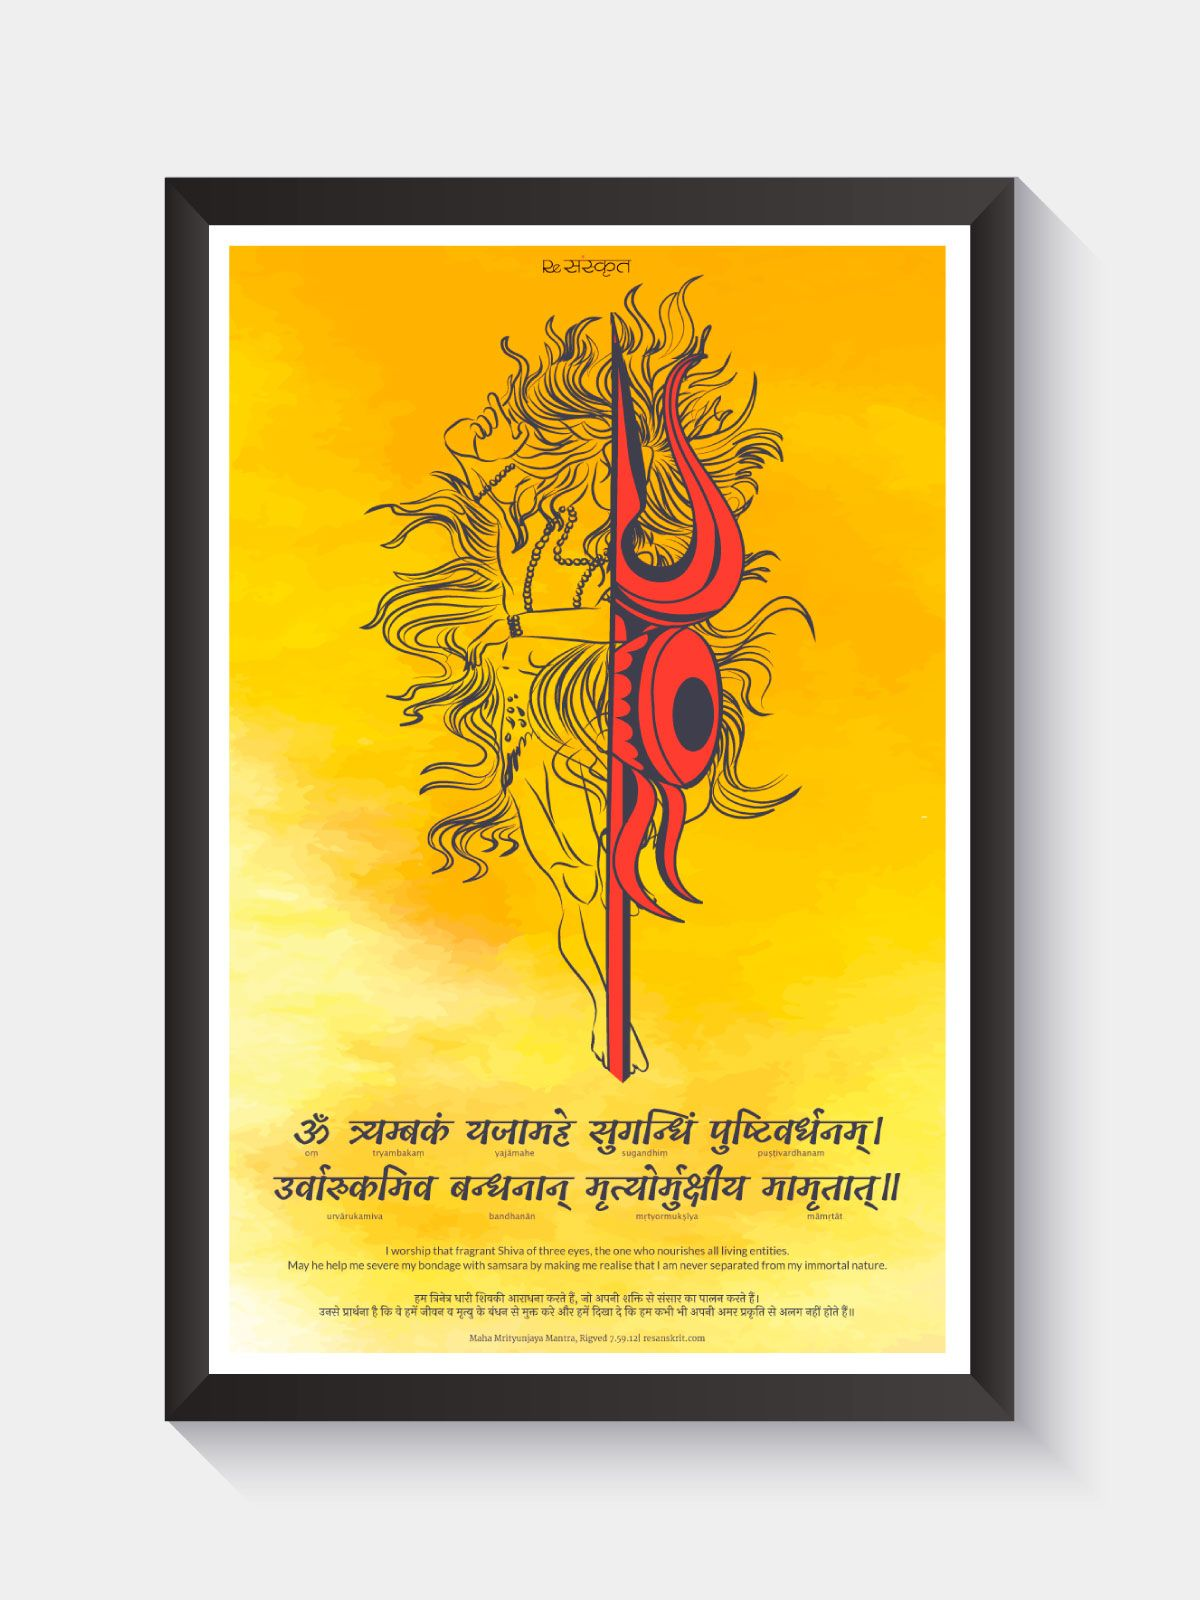 Mrityunjaya Karna Pdf